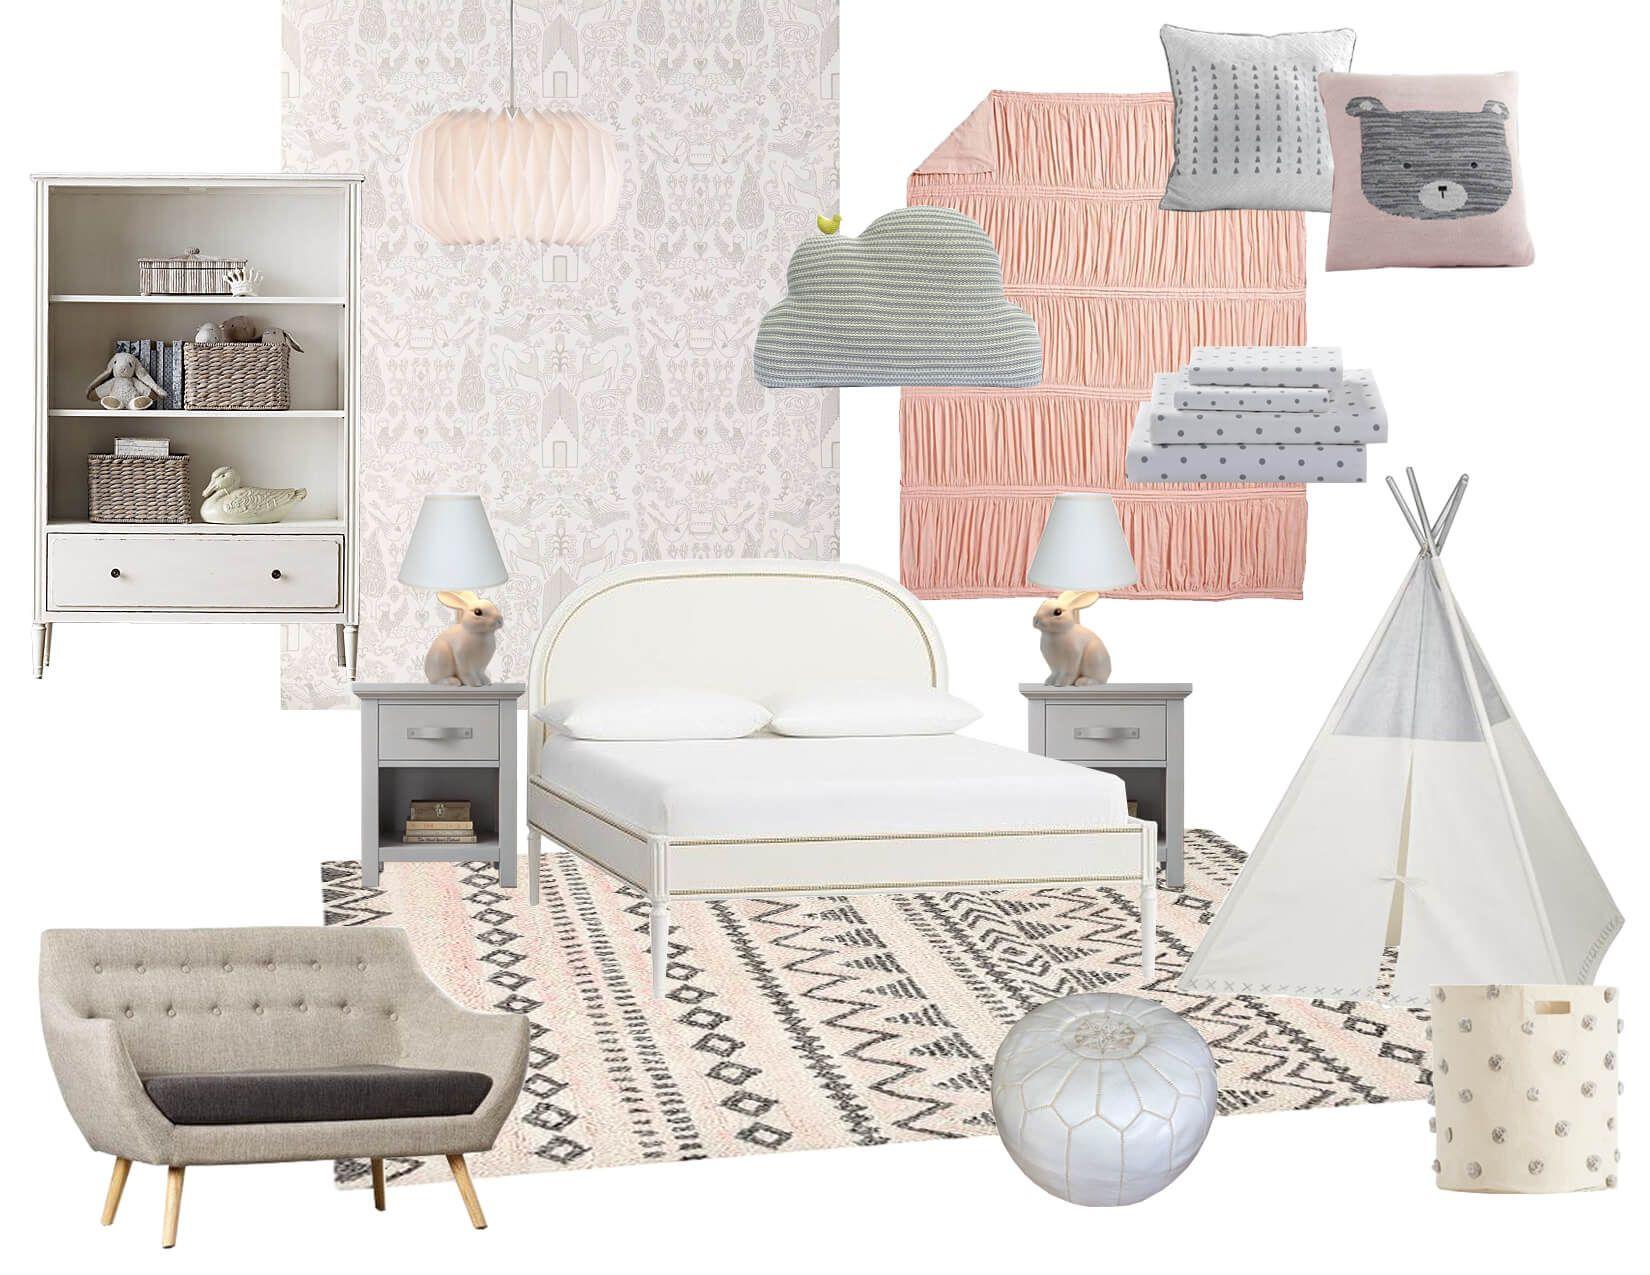 Little Girl's Playful Room Introduction and Sneak Peek | Emily Henderson | Bloglovin'